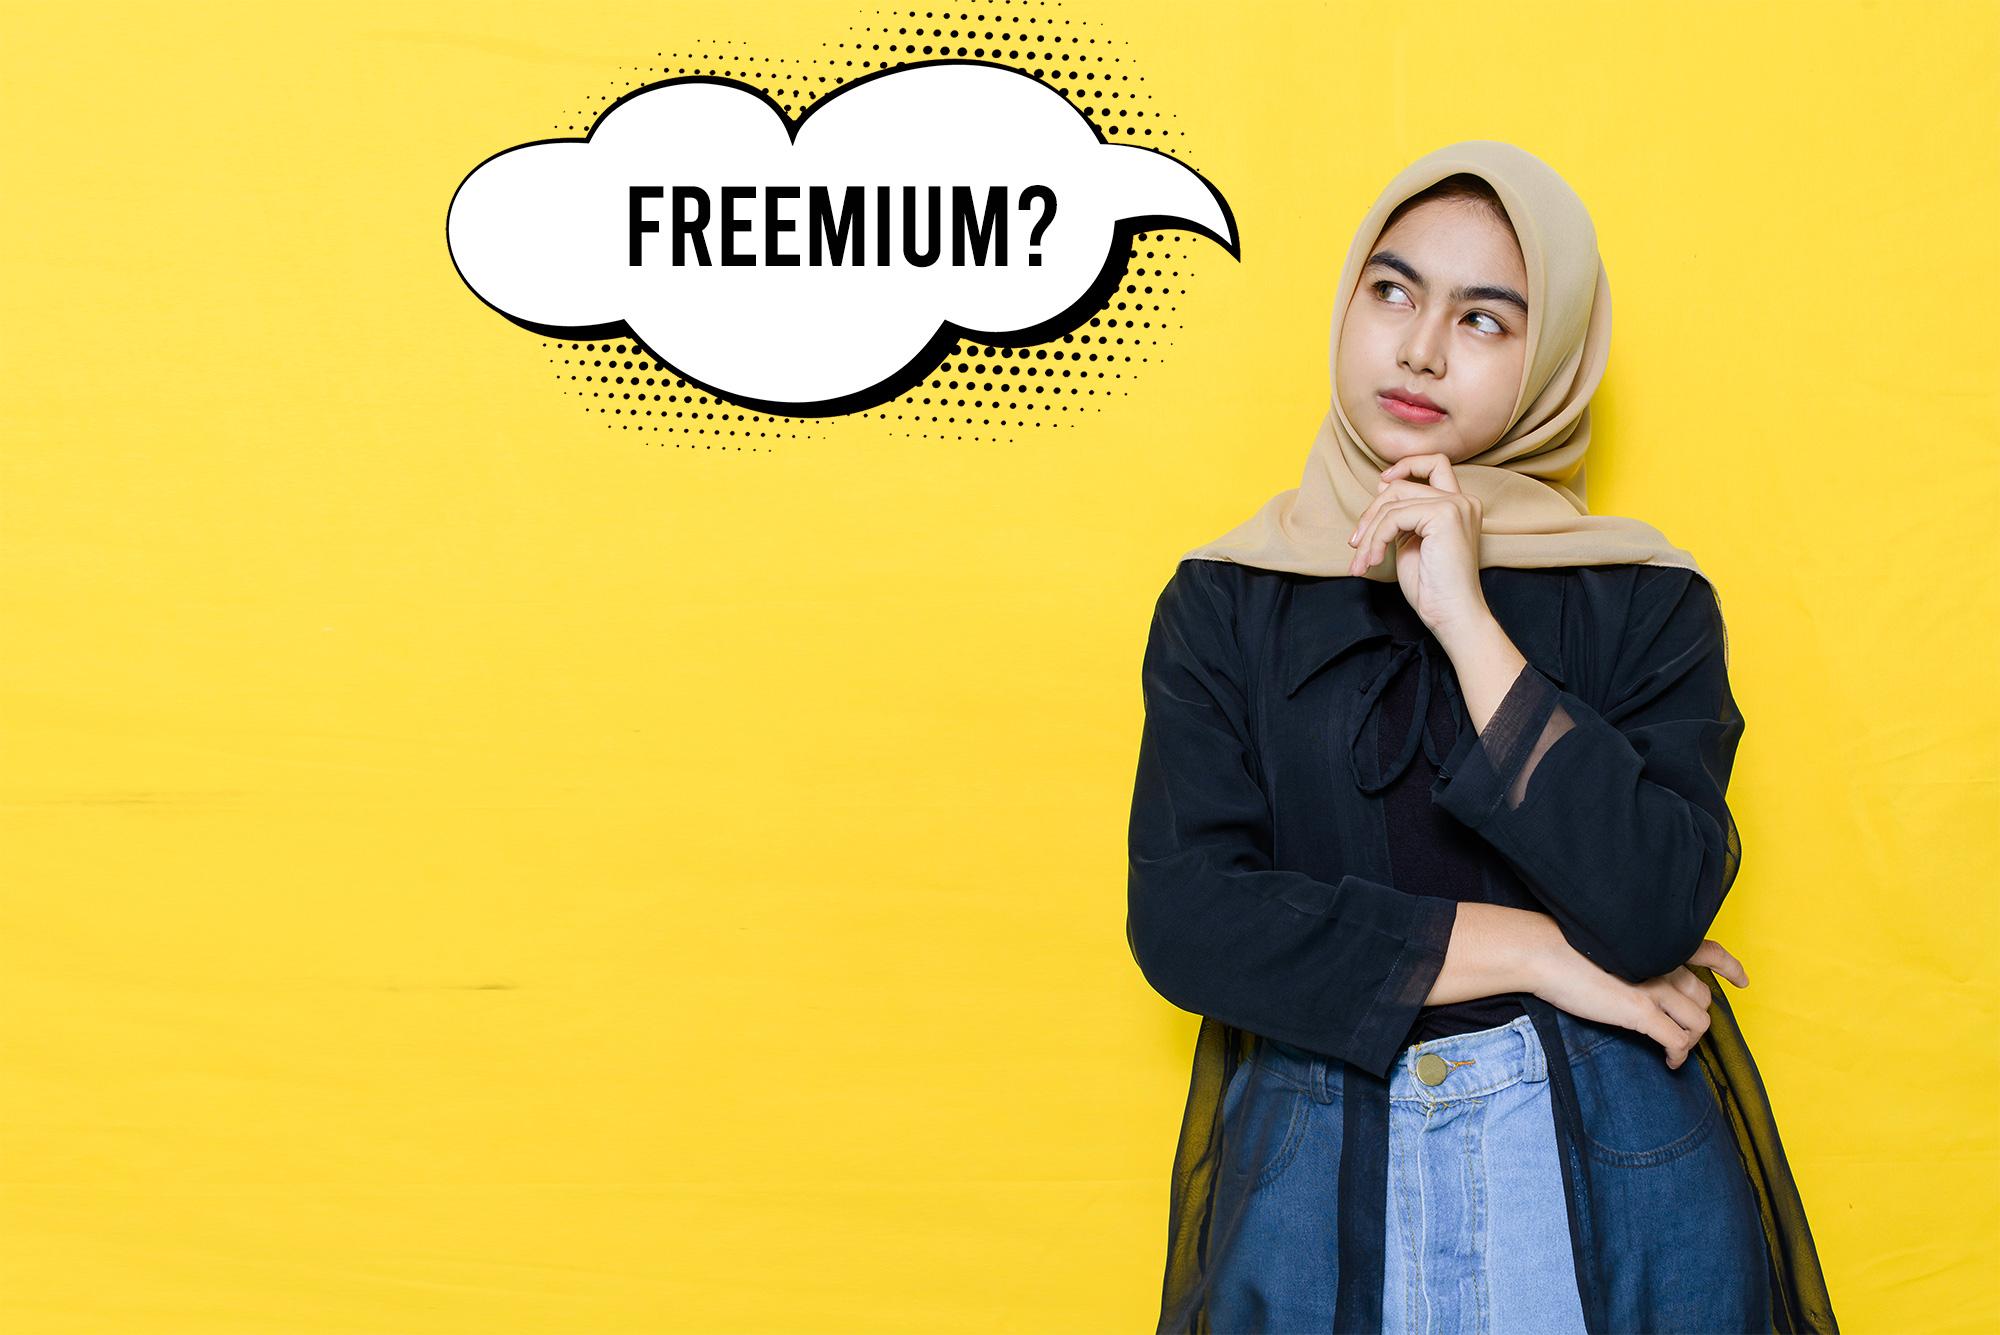 kledo pivot freemium